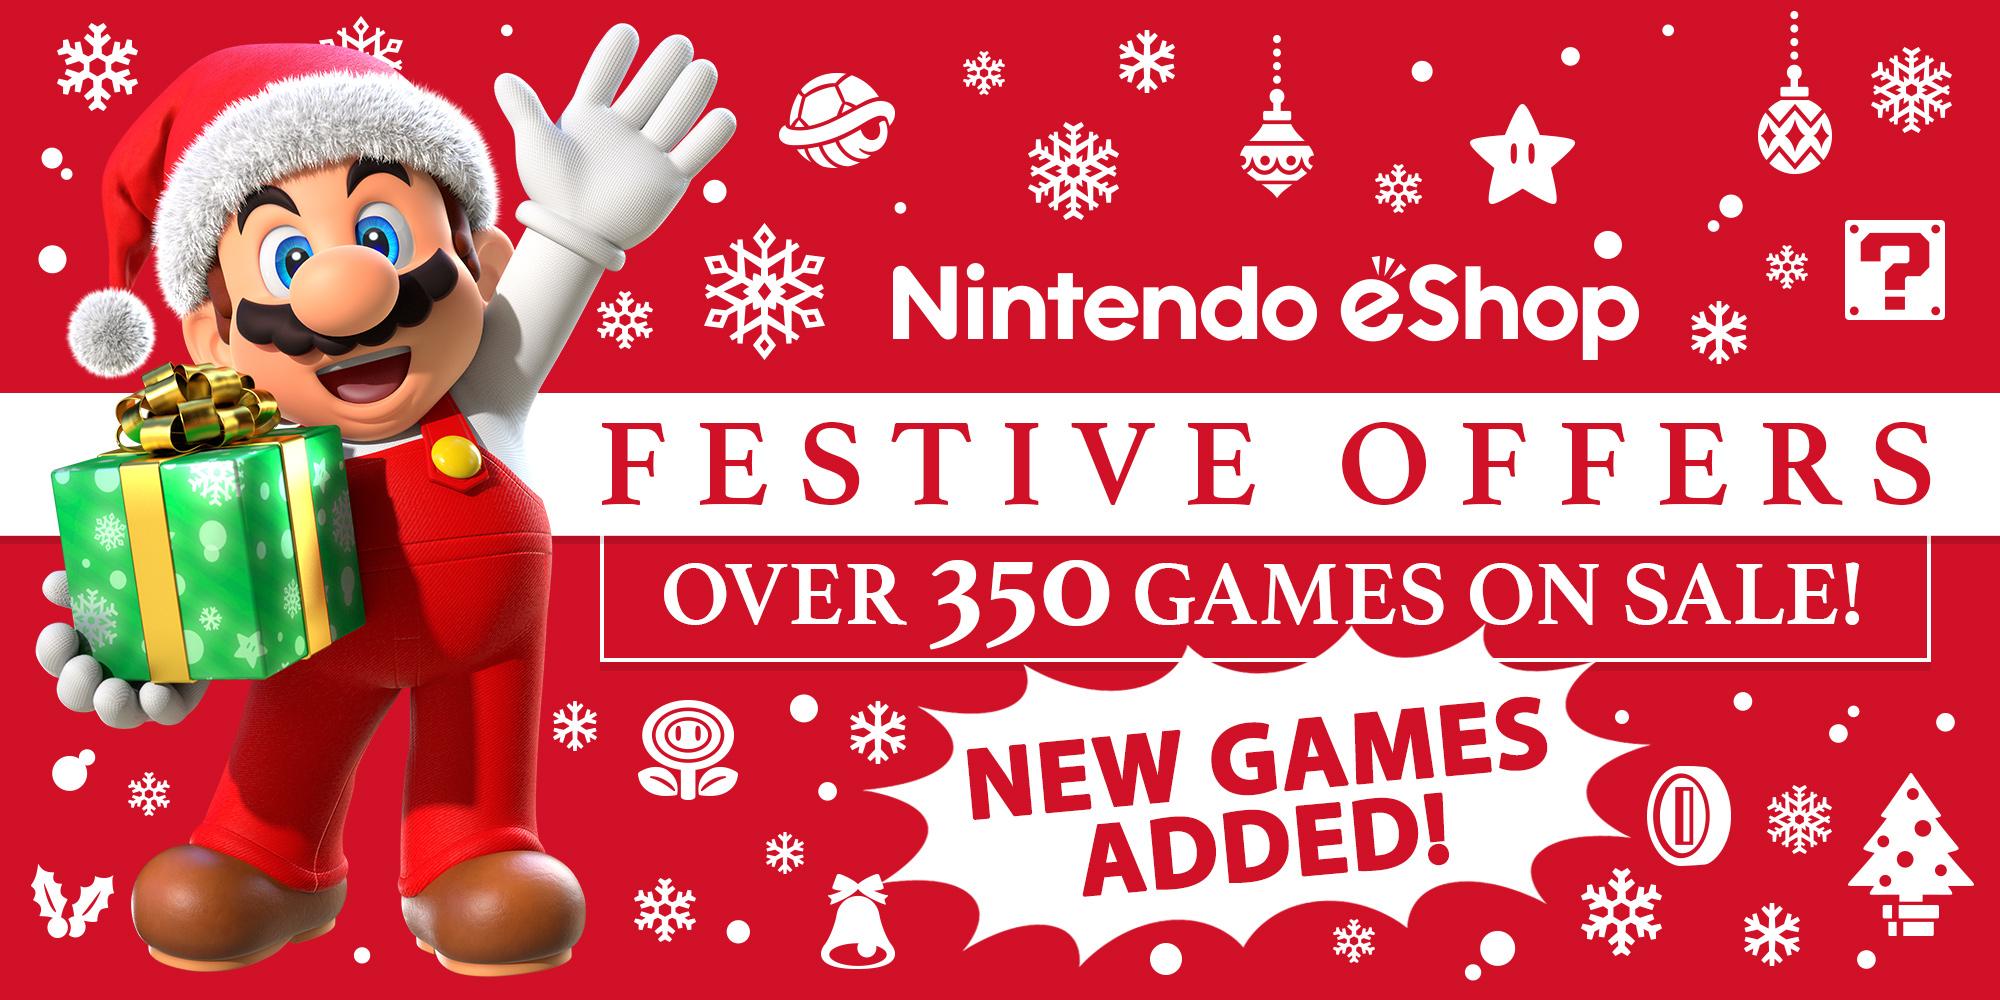 Nintendo eShop sale: Festive Offers 2017 | News | Nintendo